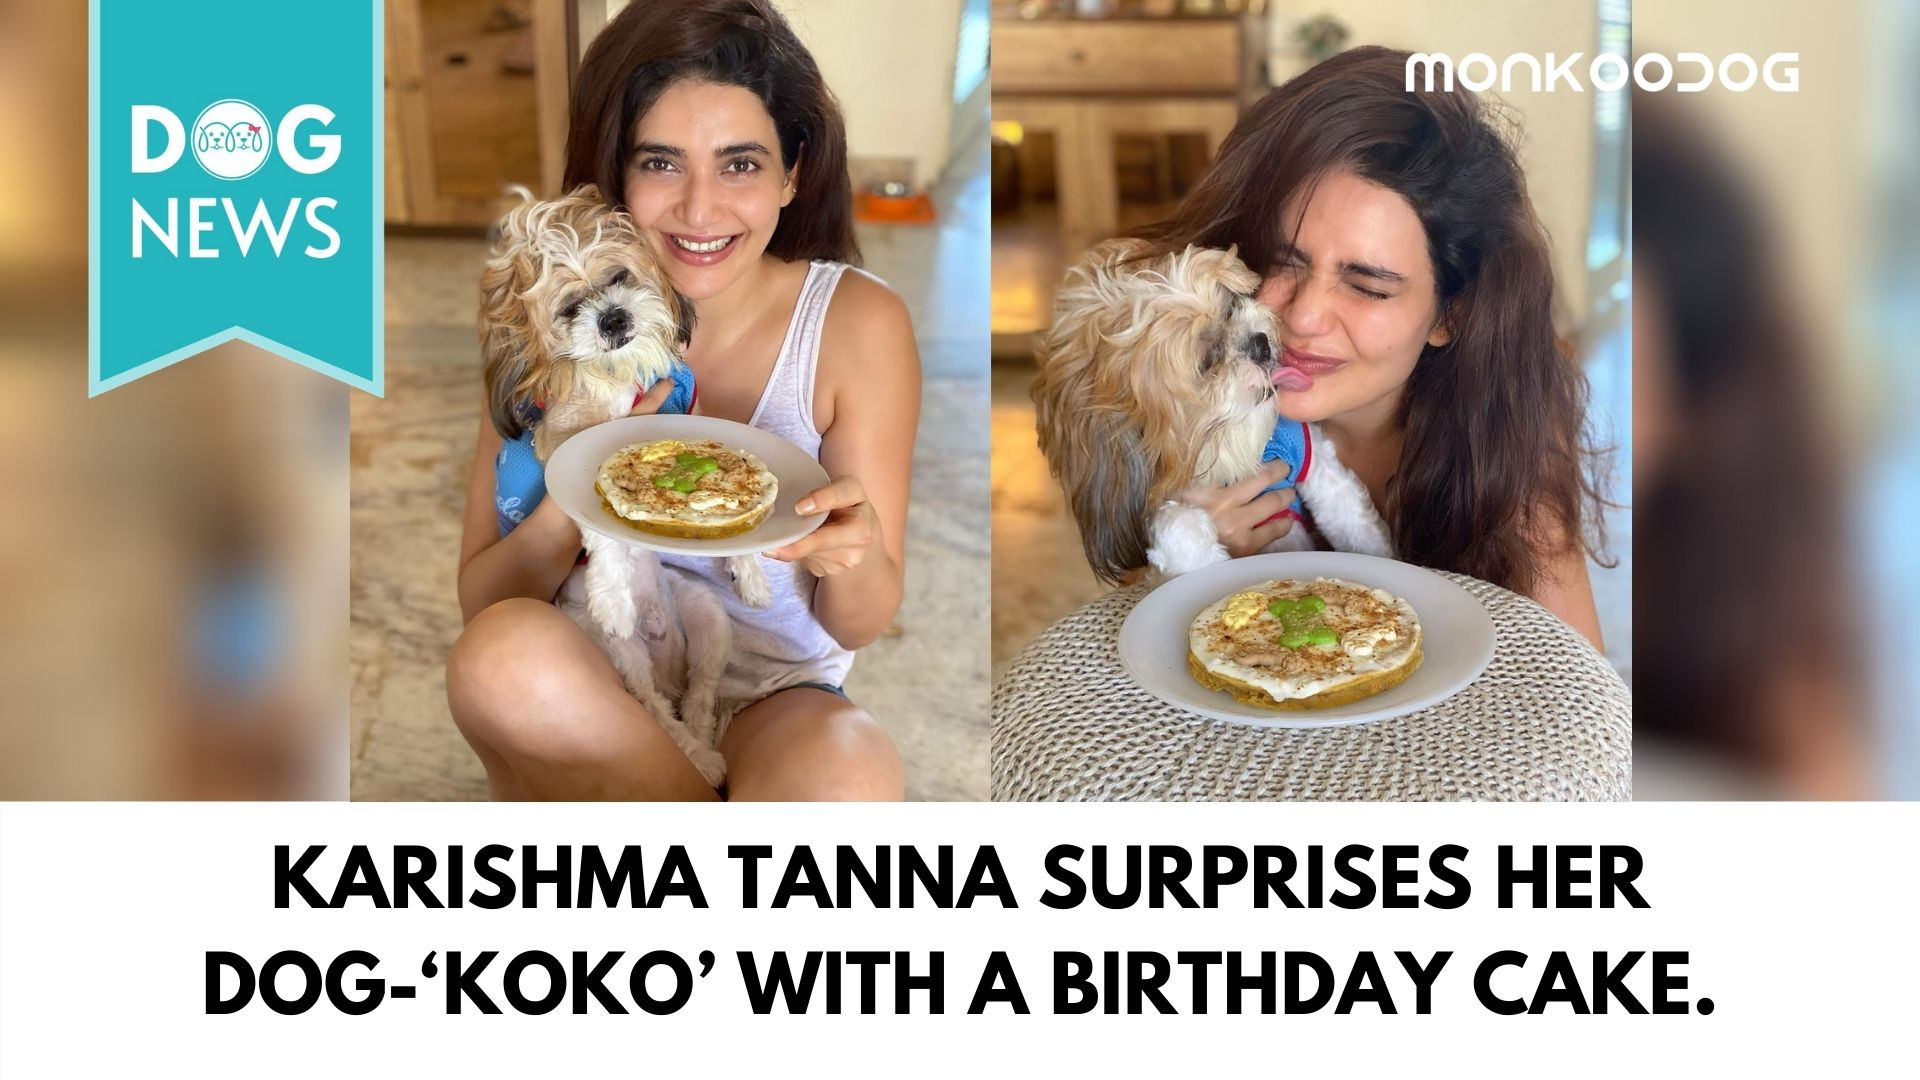 Karishma Tanna surprises her cute little dog-'koko' with a yummy cake on his birthday.